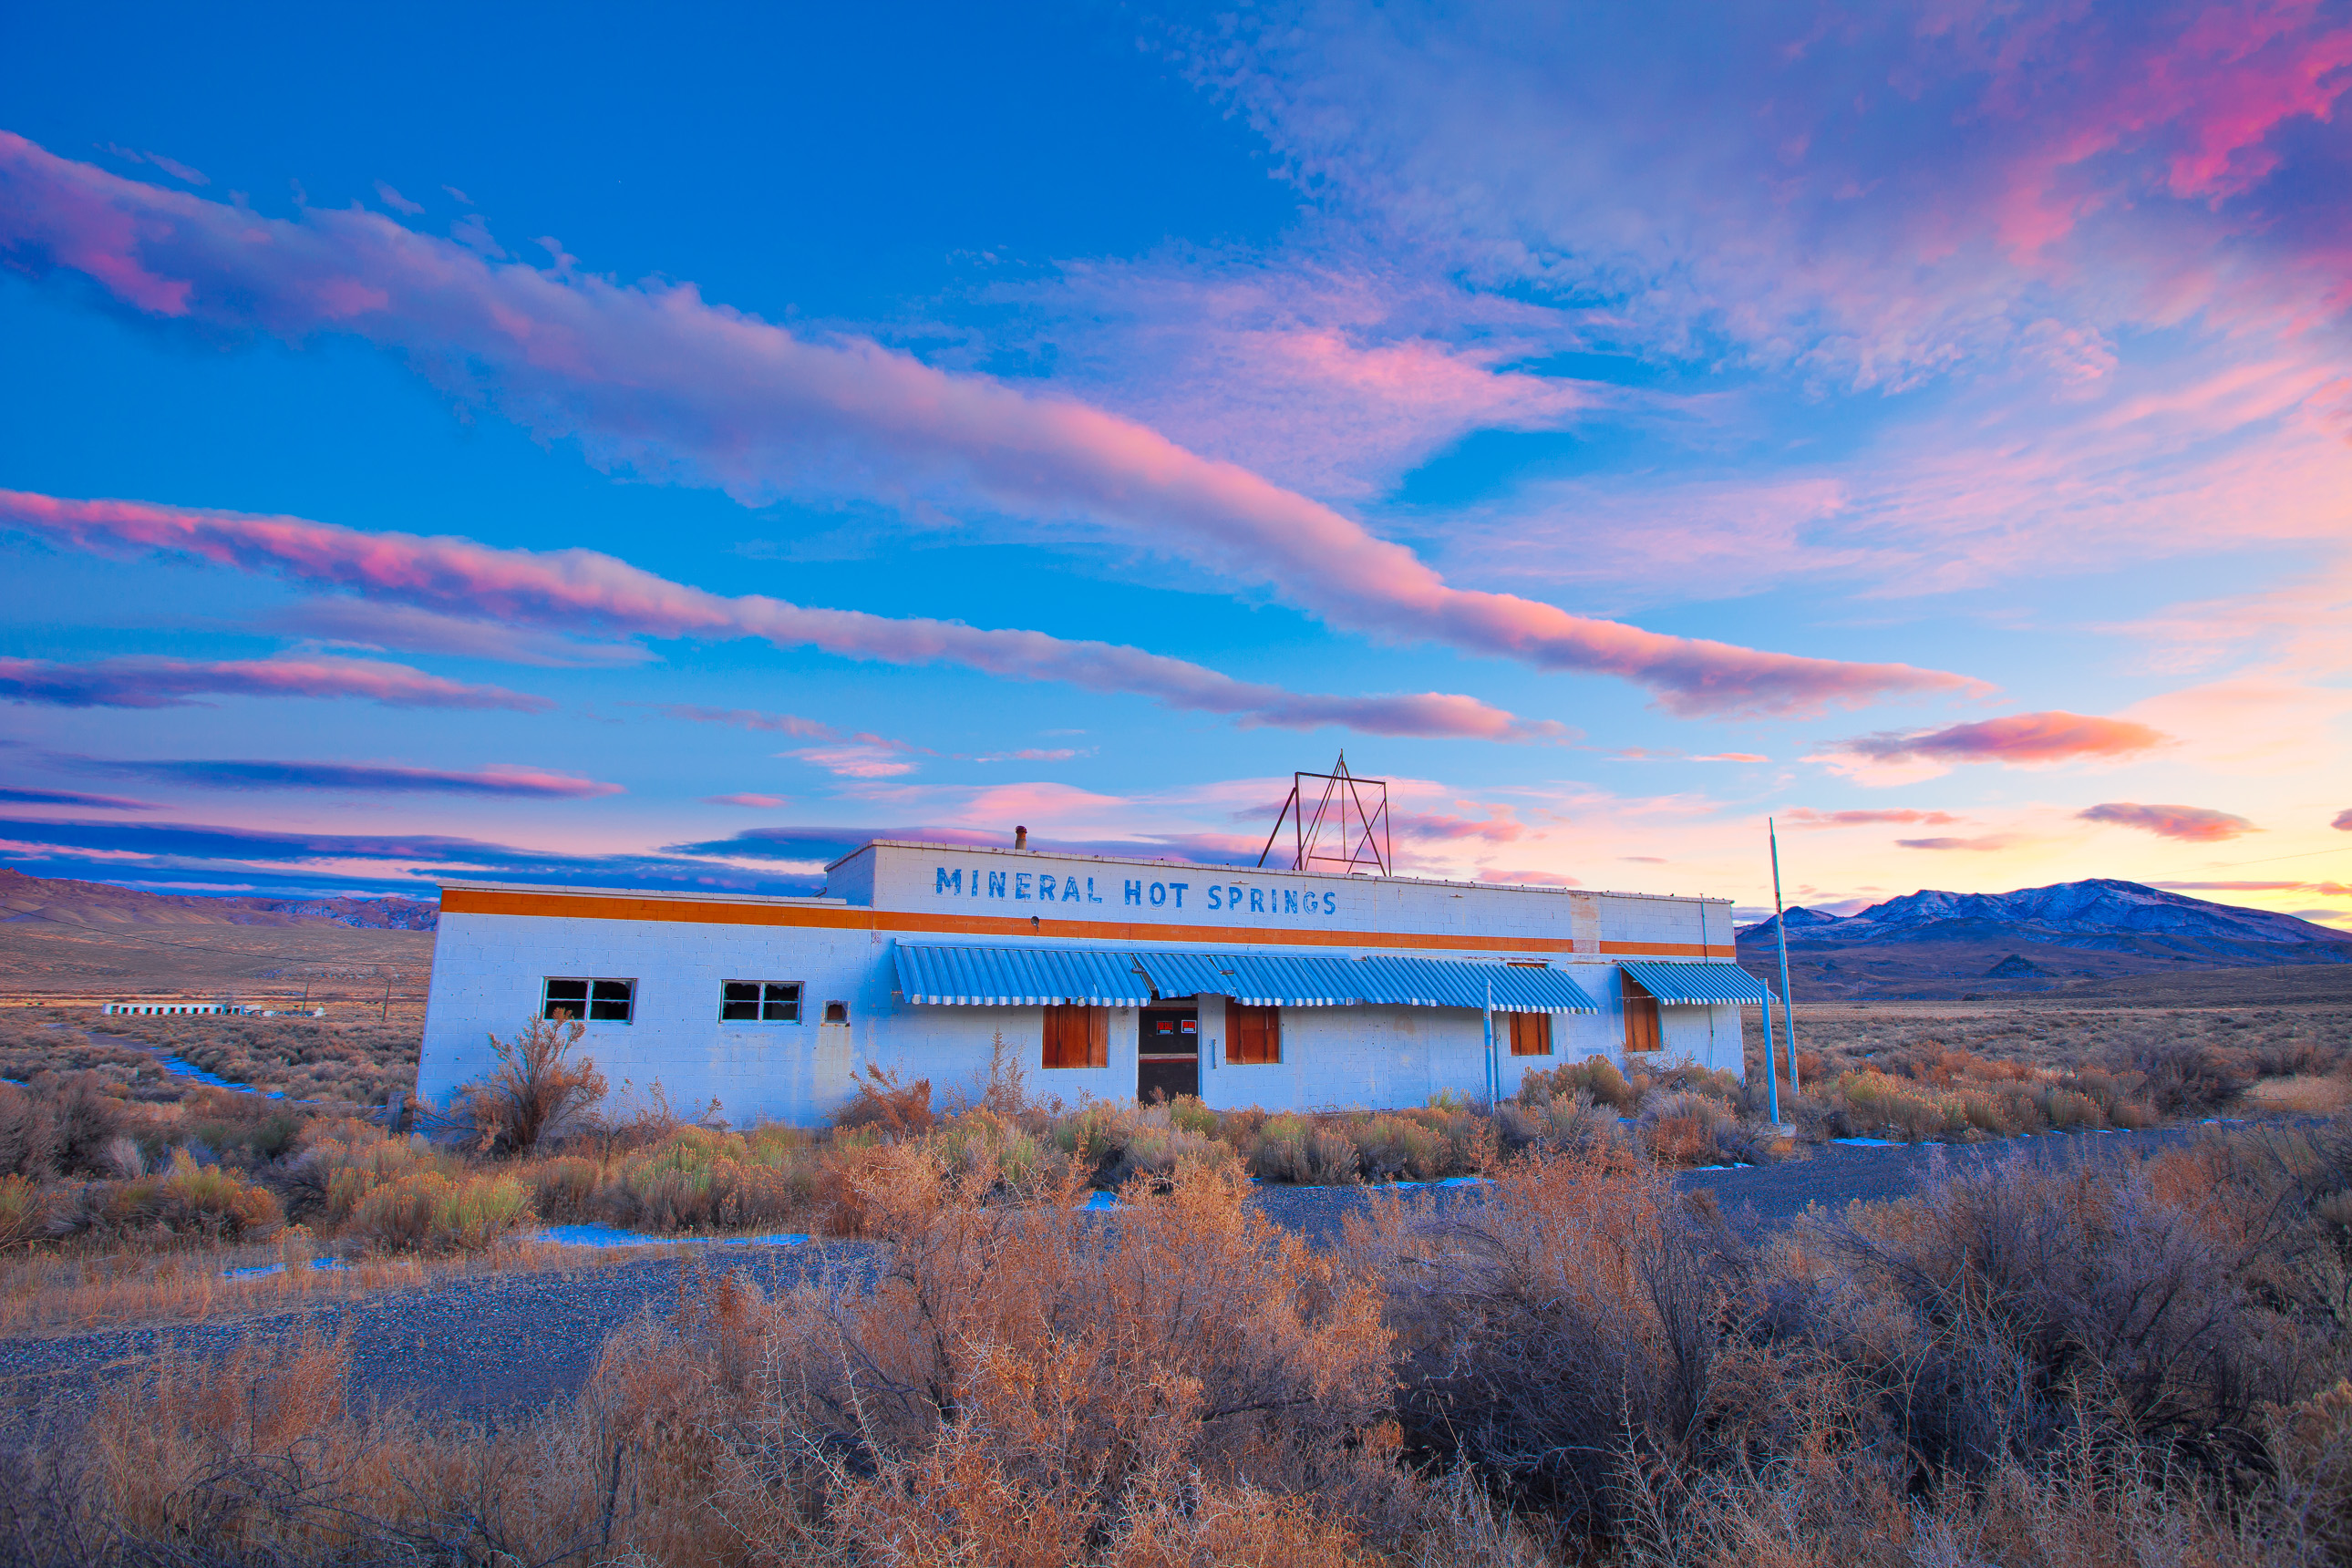 Abandoned Mineral Hot Springs near Jackpot Nevada